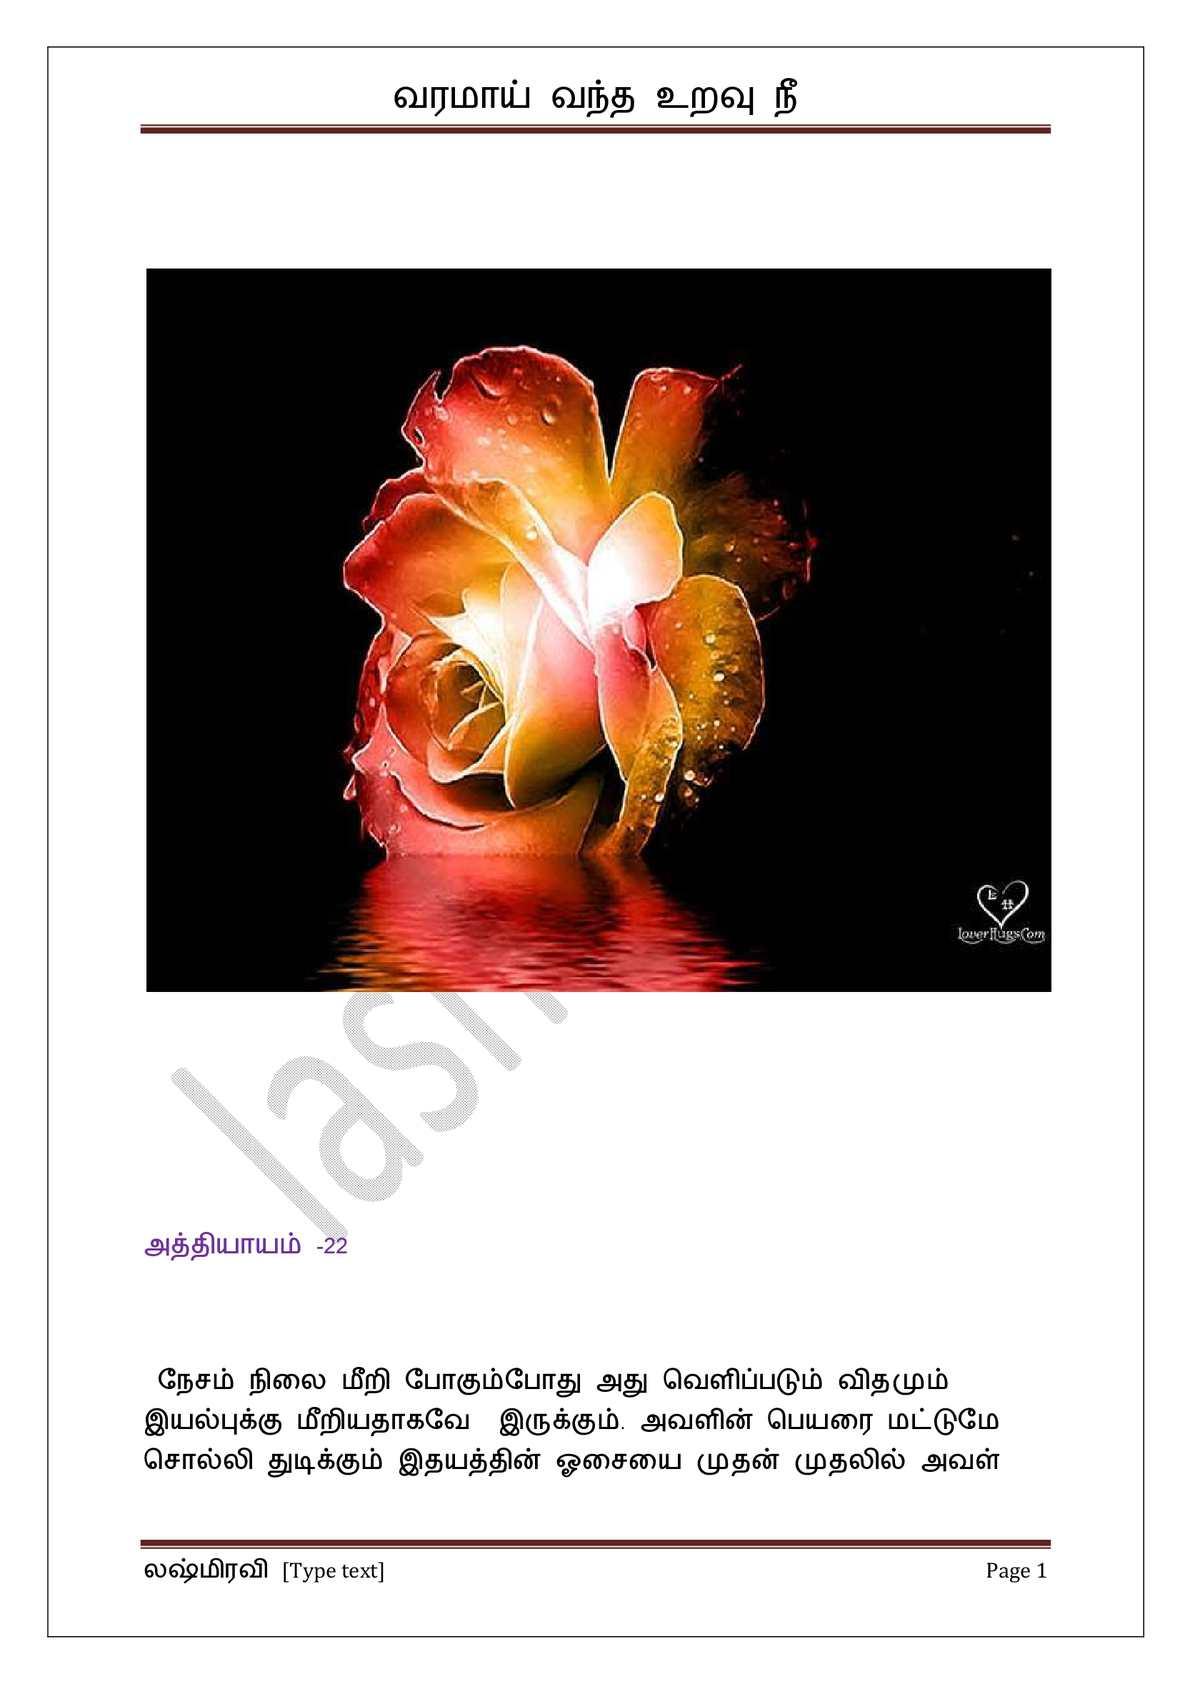 Varamaai Vantha Uravu Nee 22